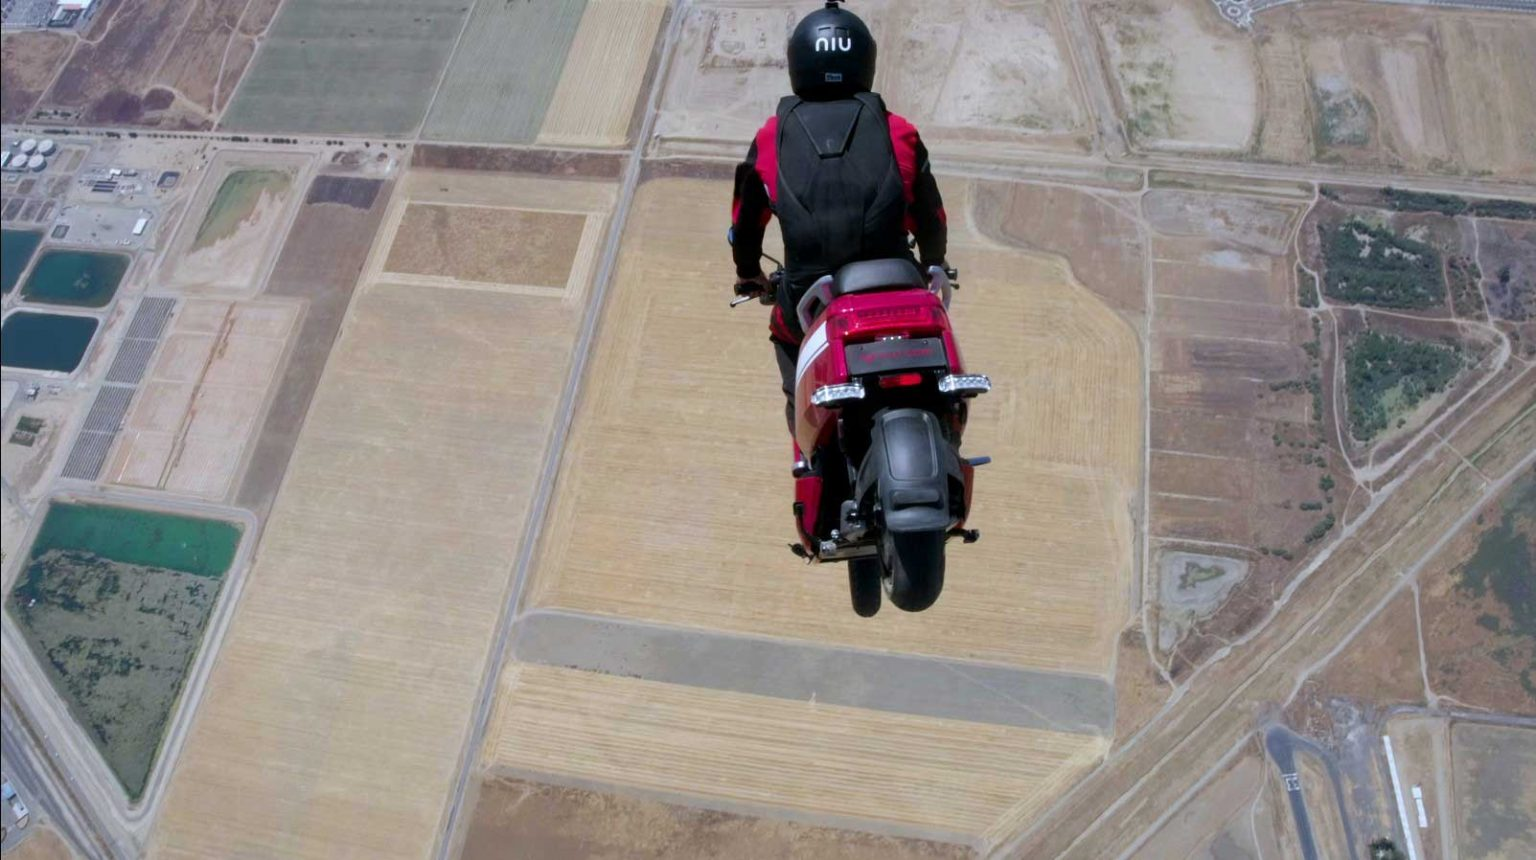 Skydive Stunt Jump 2 OPT 1536x860 1